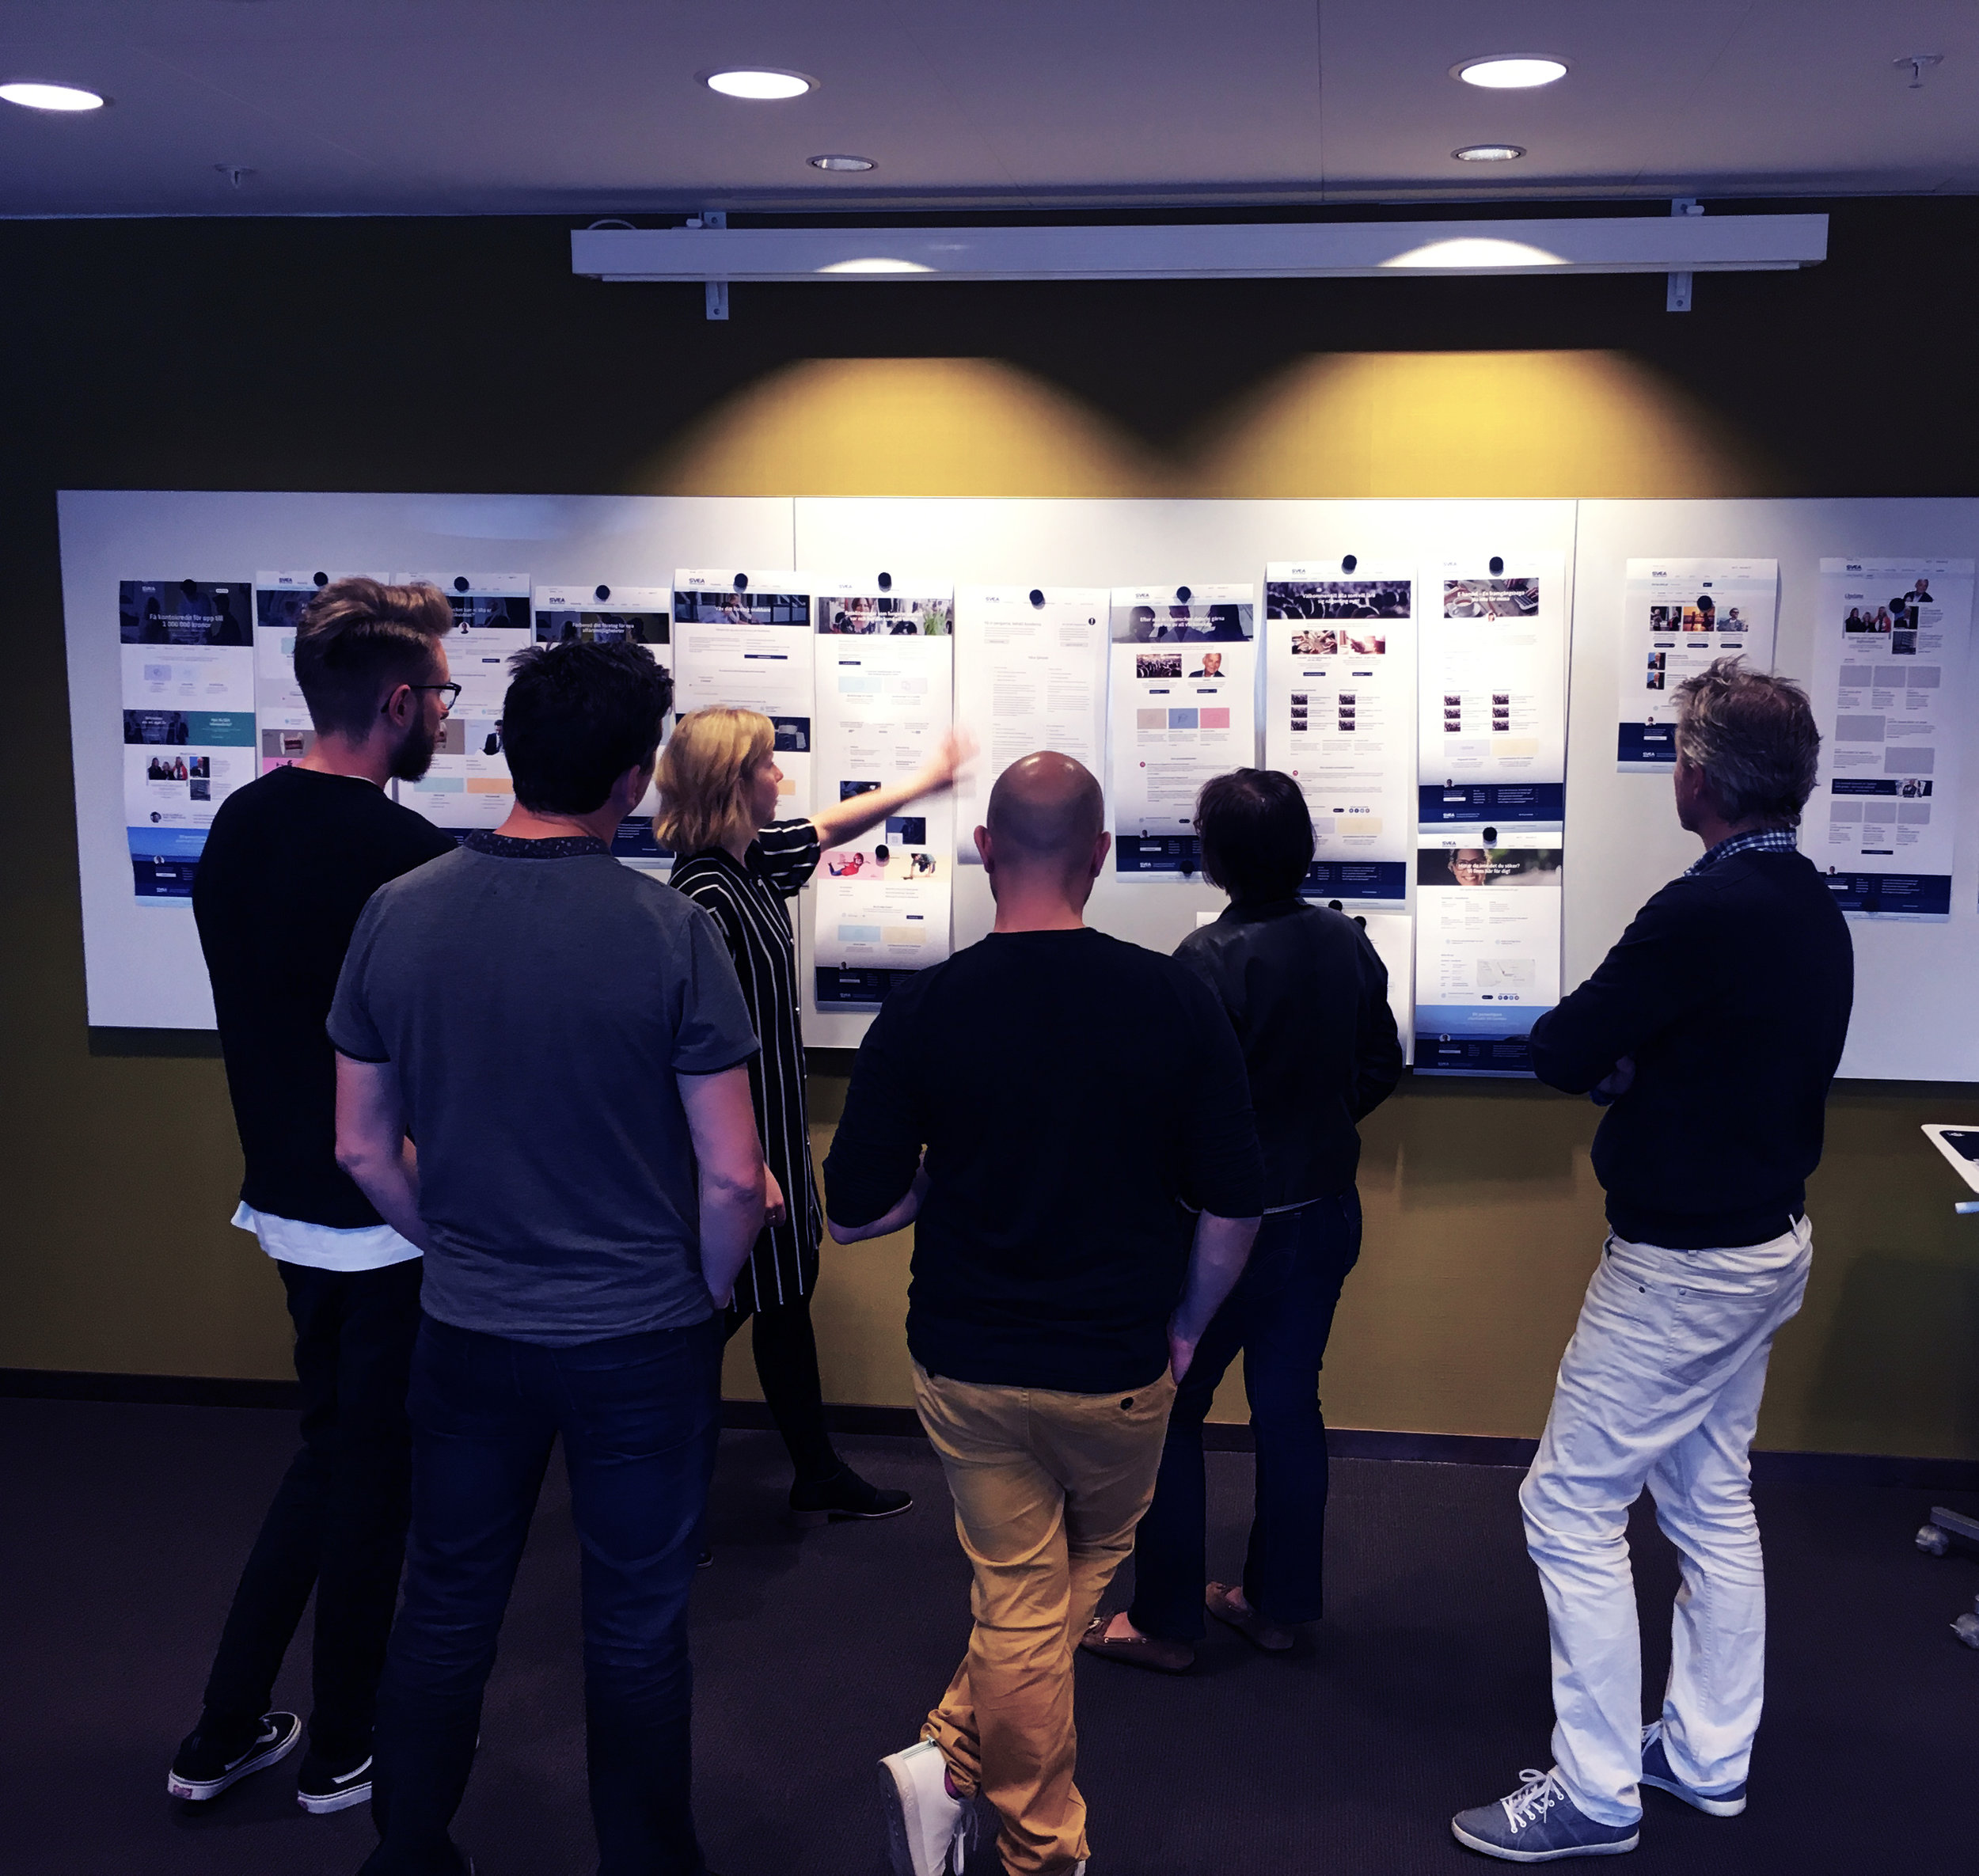 Design review with the marketing team at Svea Ekonomi